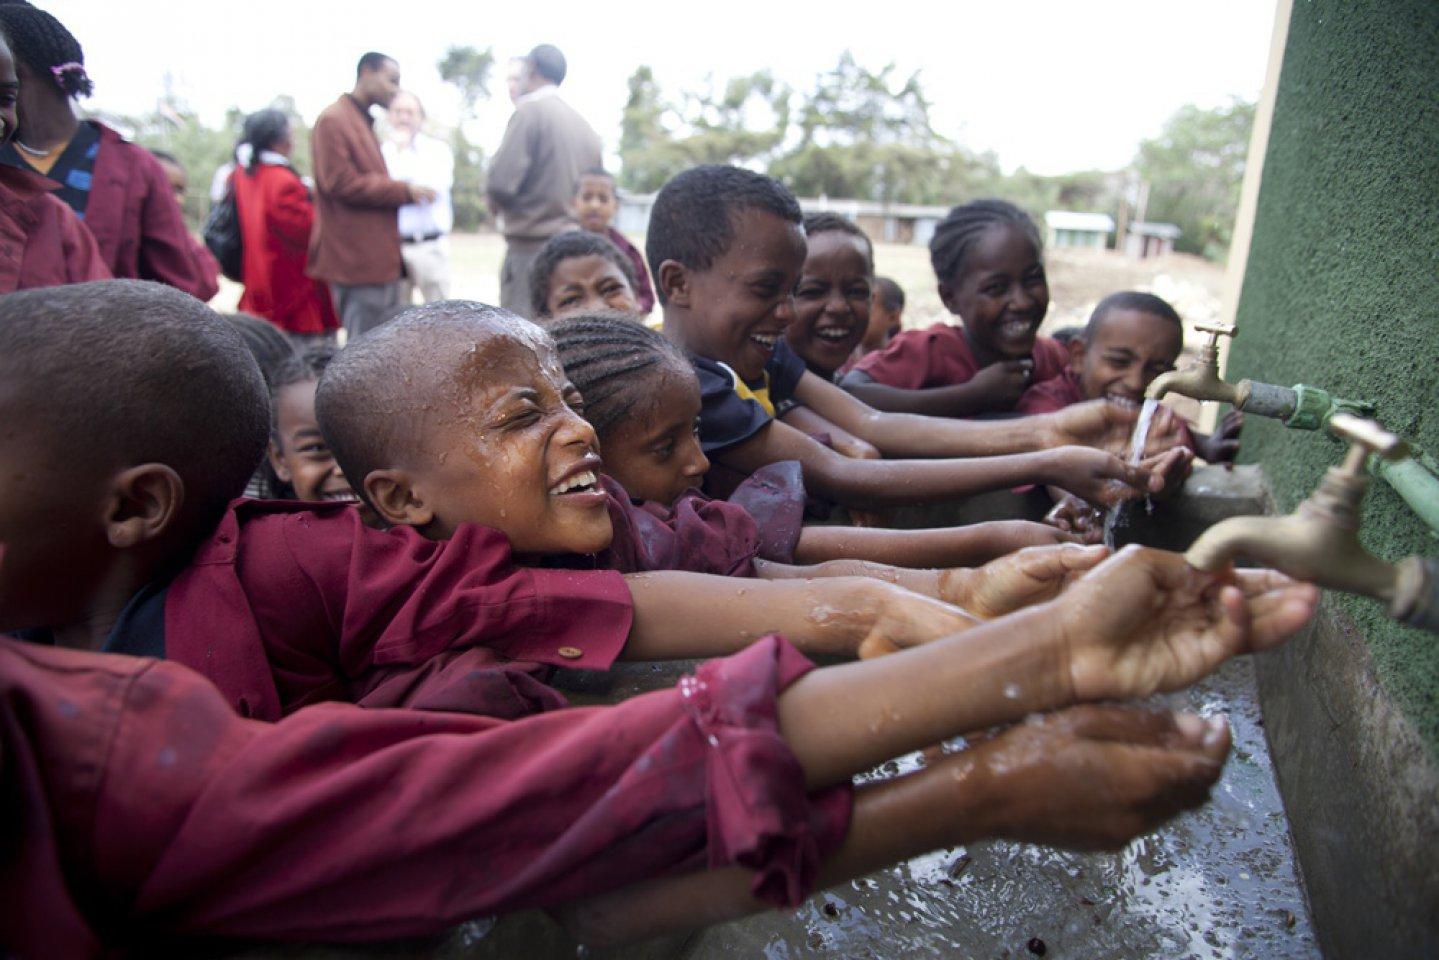 https://www.waterforlife.nl/files/visuals/_1920x960_fit_center-center_85_none/2012-ethiopia-bogaerts-vei-02-1000px.jpg